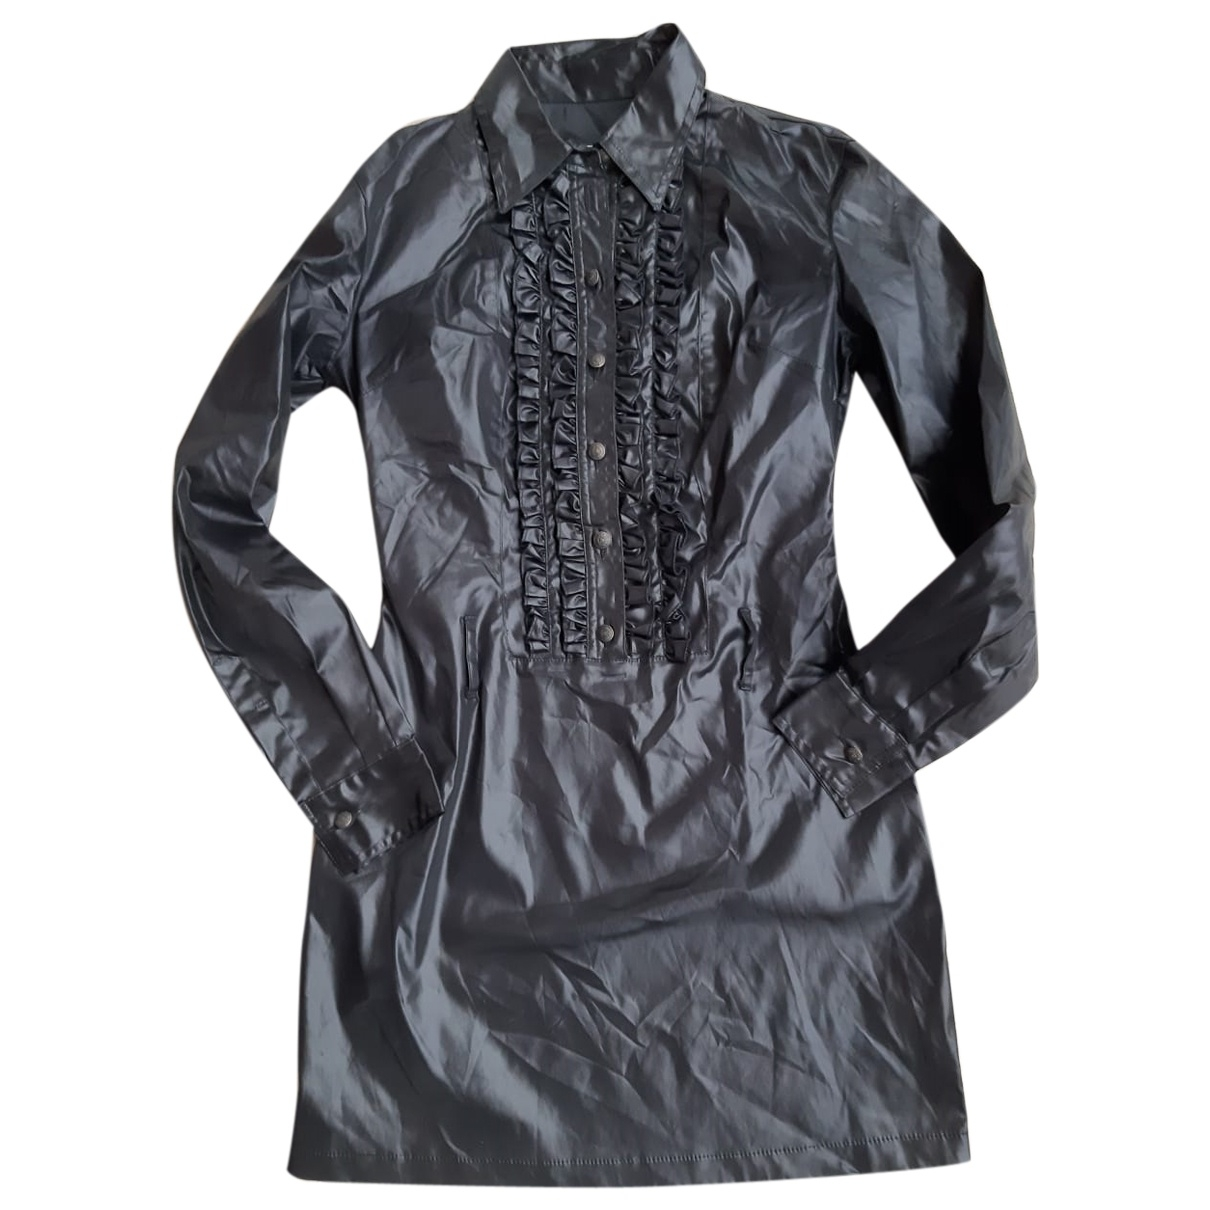 Moschino Love \N Black dress for Women 42 IT